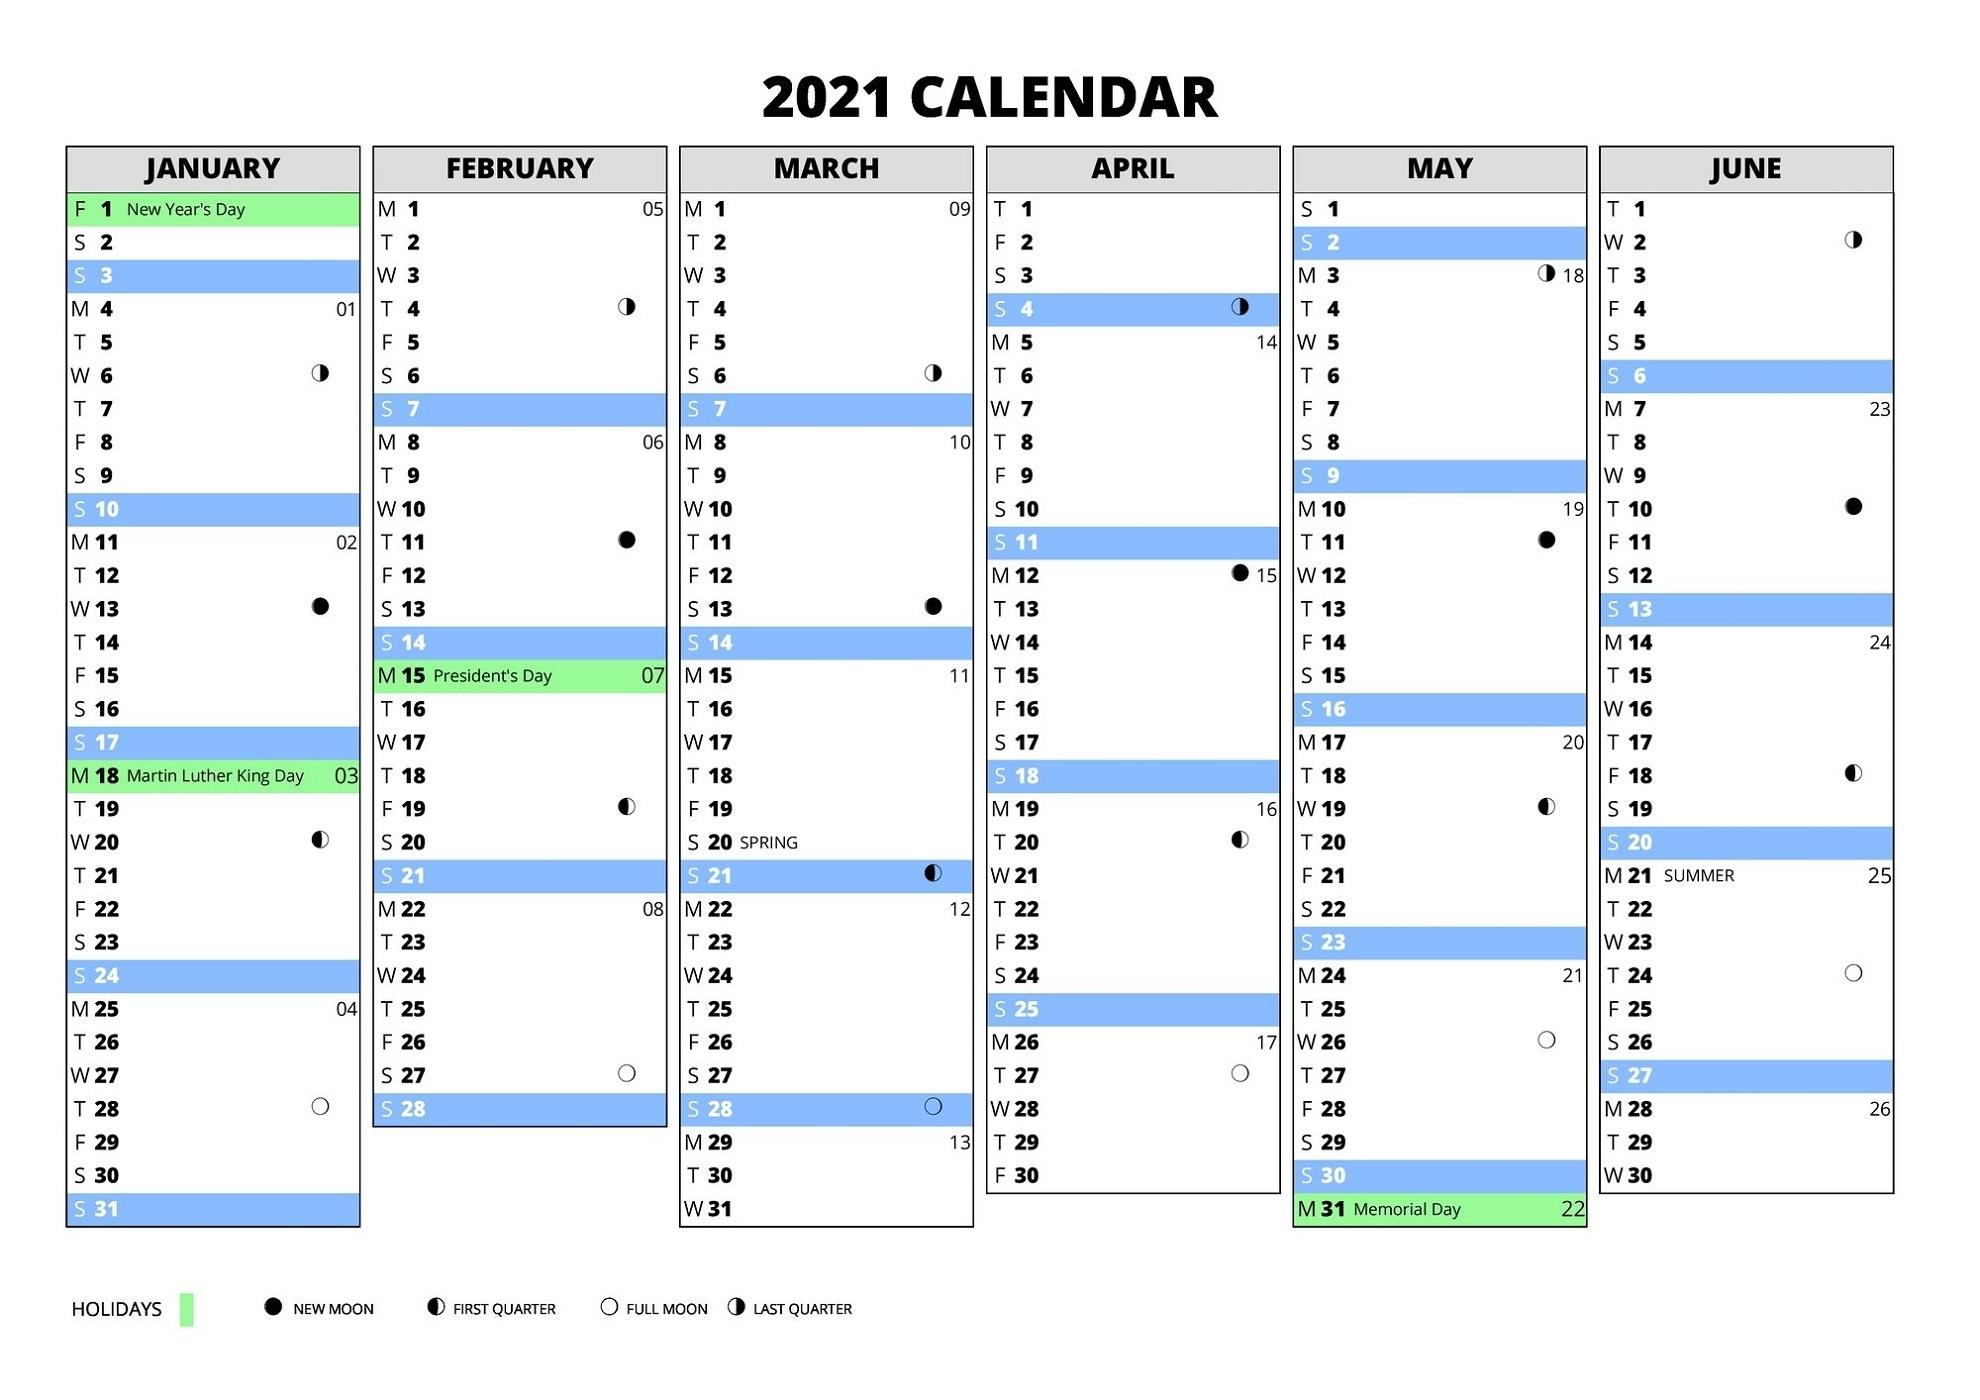 2021 Calendar With Week Numbers Excel Full | Calendar Shelter